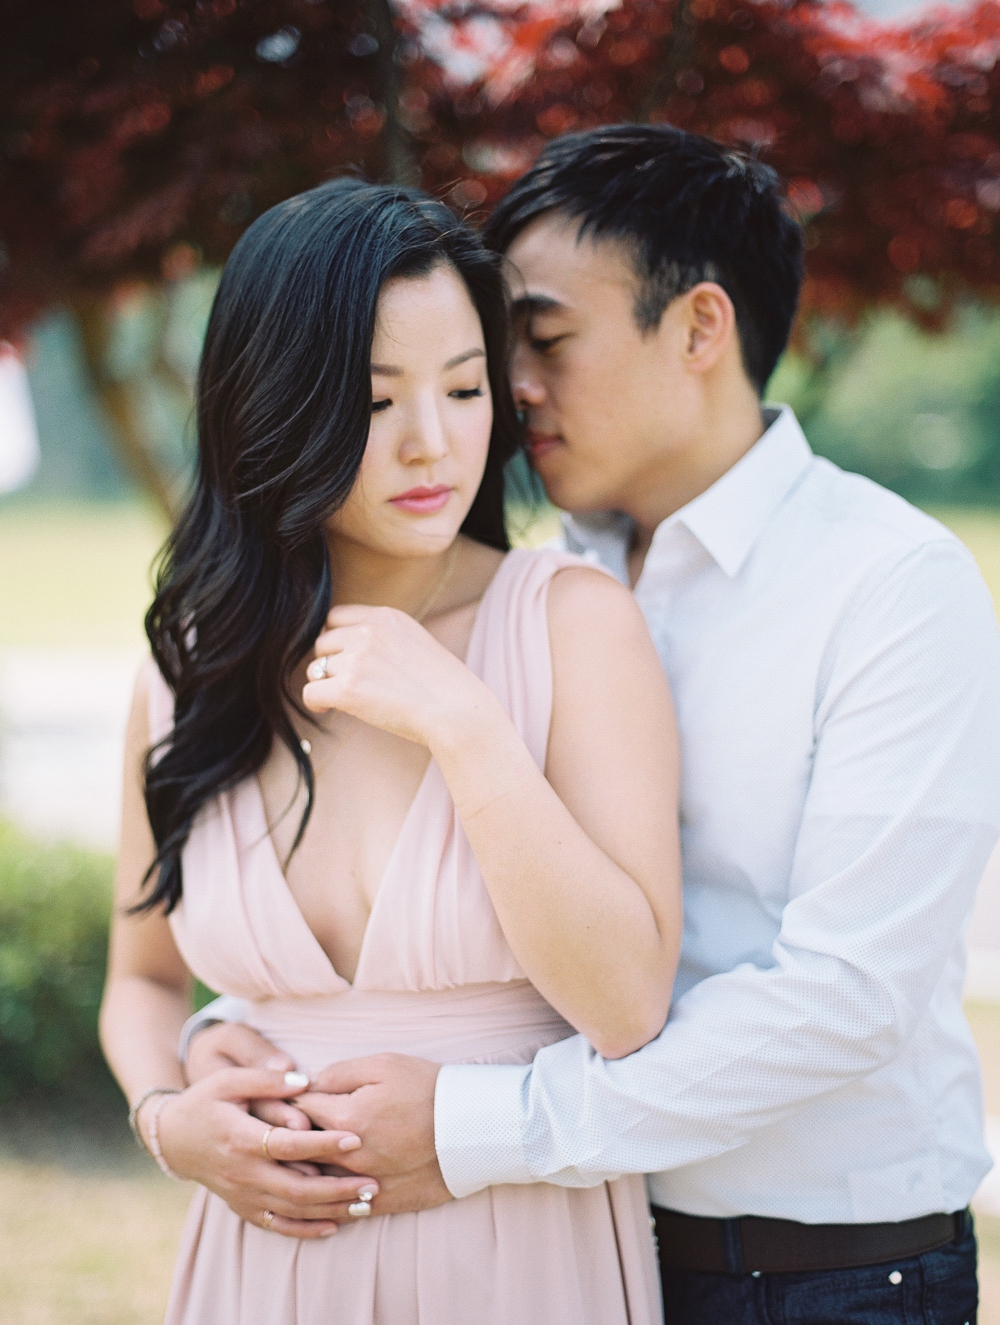 engagement seoul korea sydney ted czar goss photography collage 30.jpg